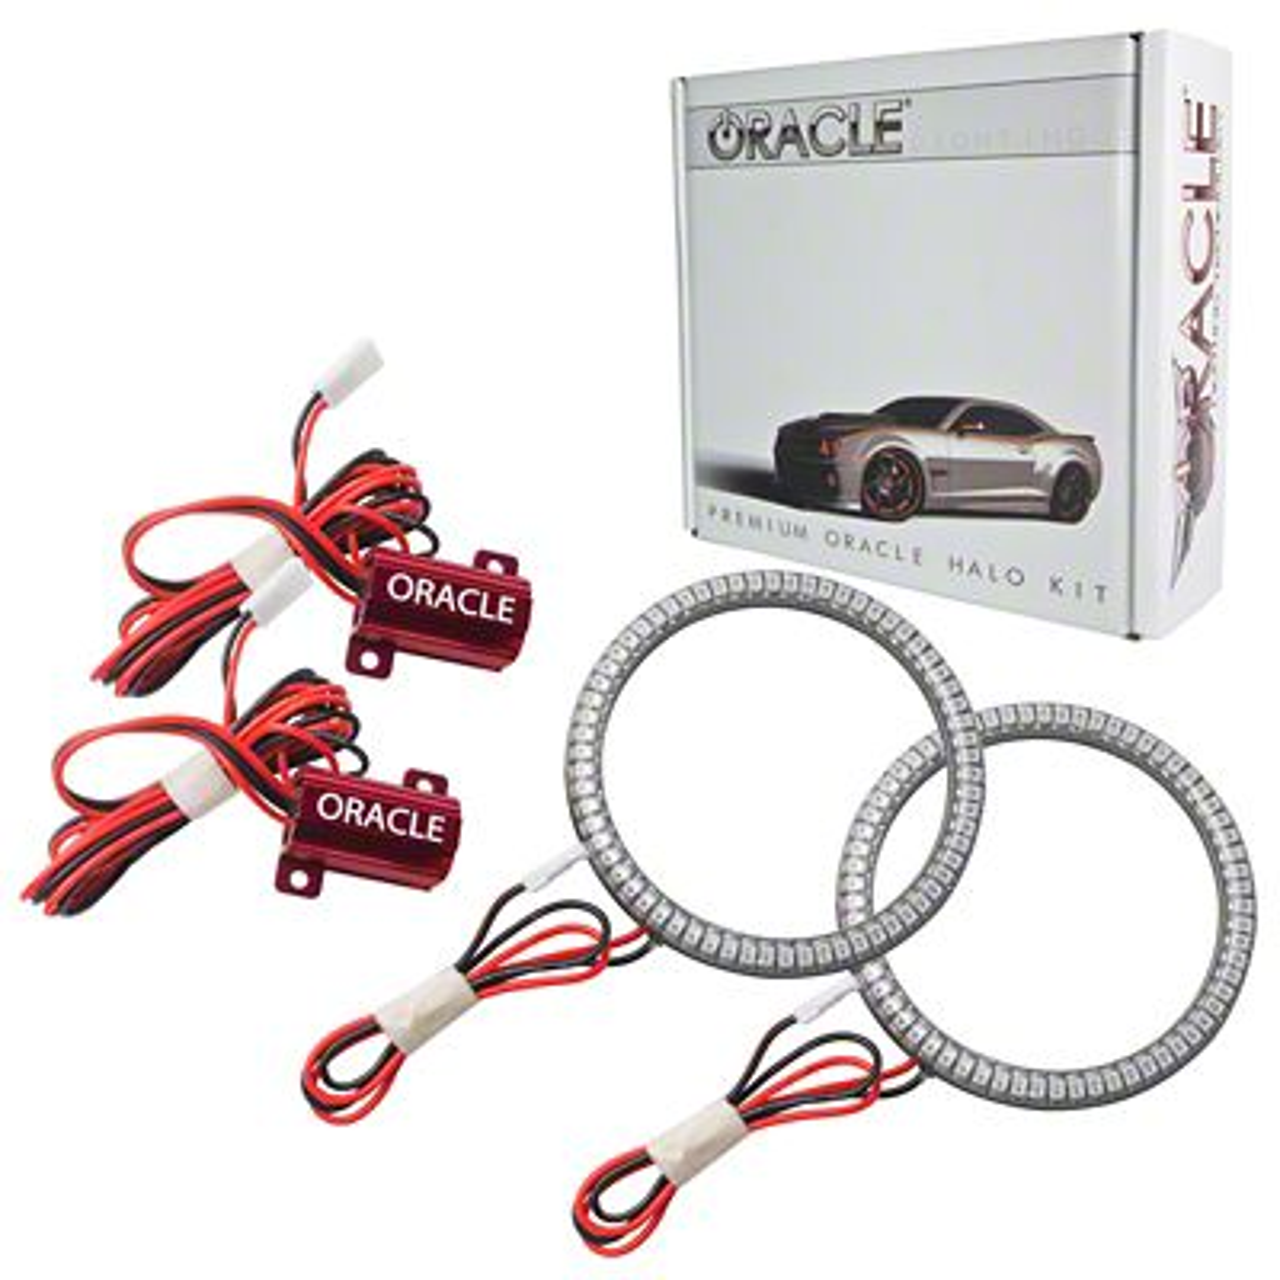 Oracle LED Waterproof Fog Light Halo Conversion Kit - Red (07-18 Jeep Wrangler JK)